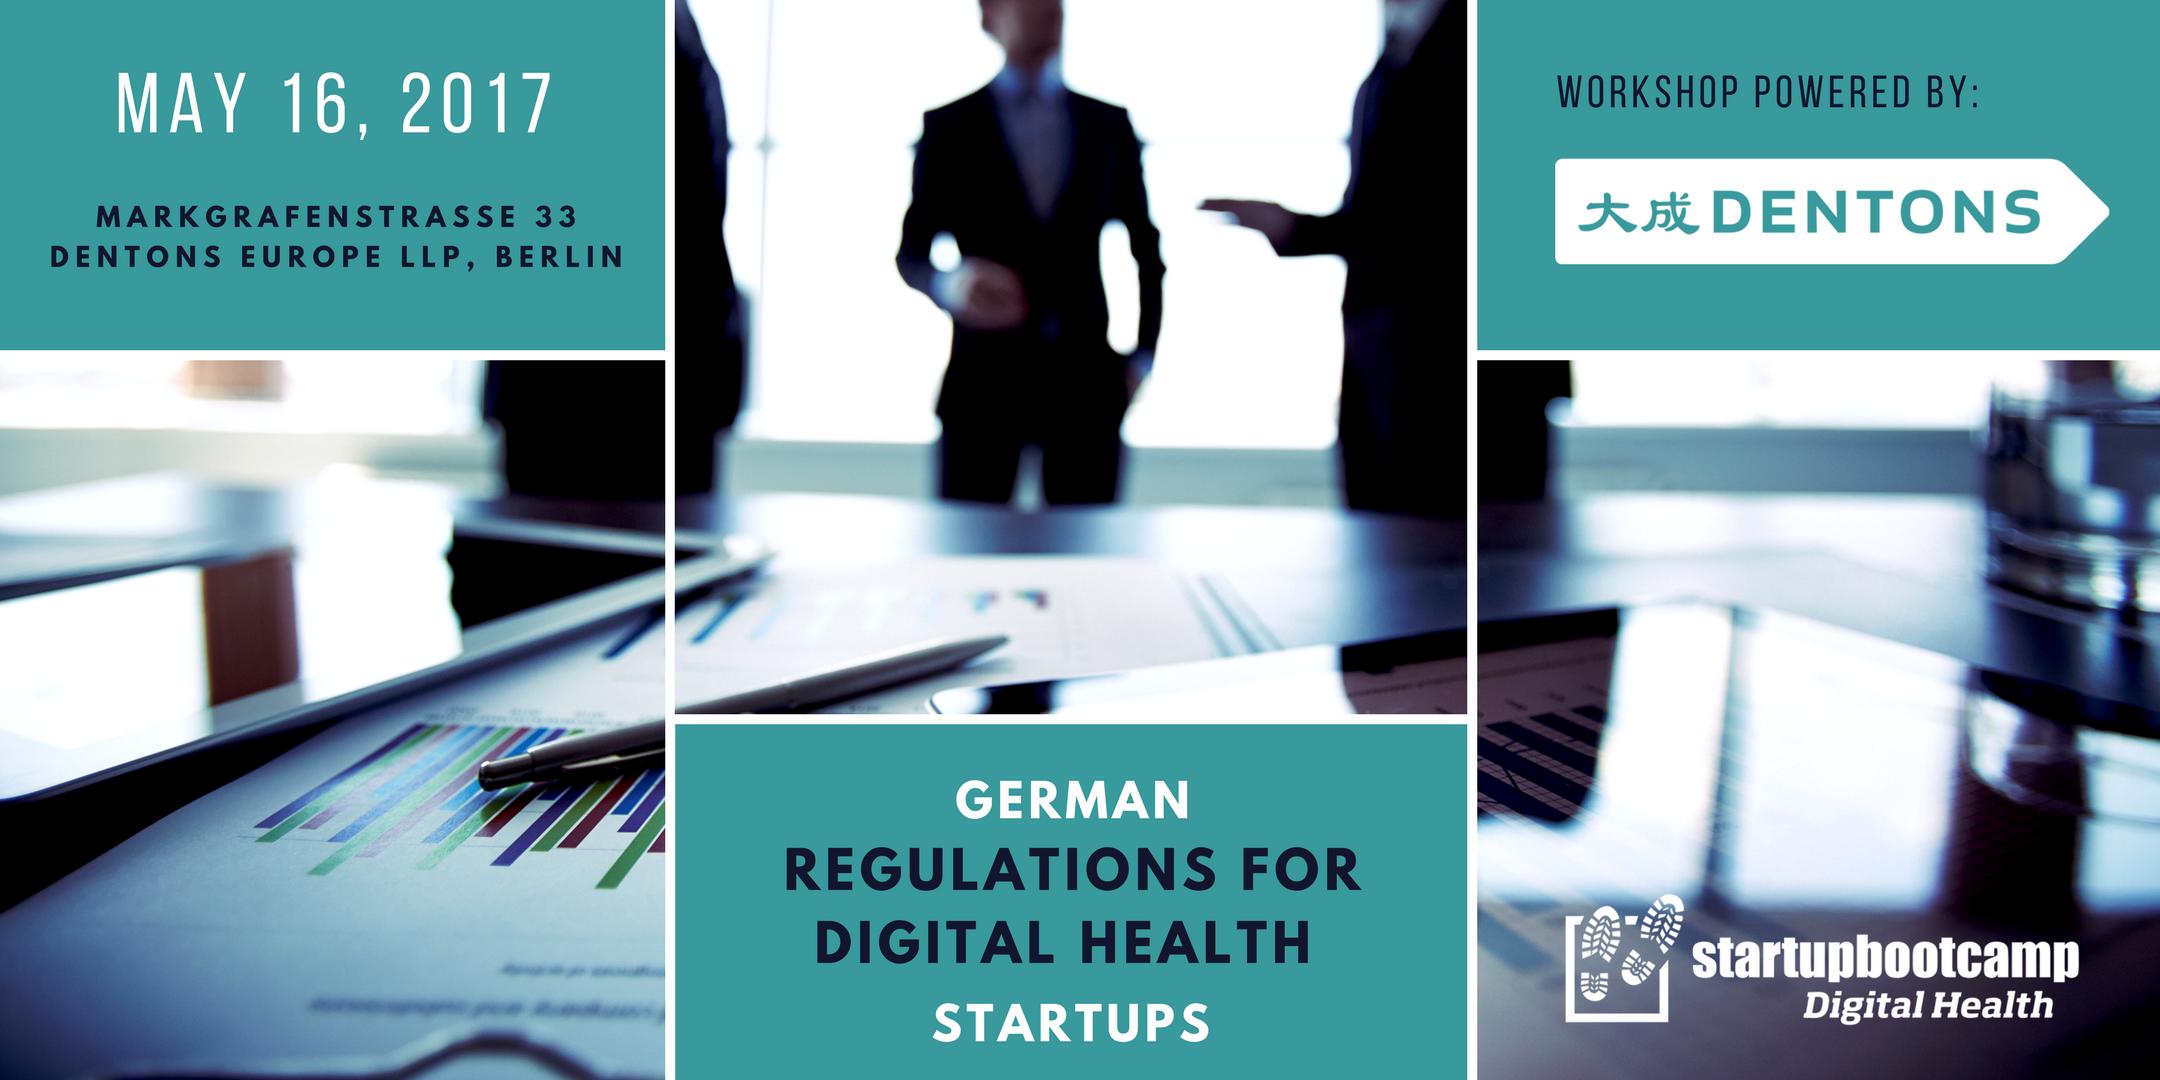 german regulations meetup digital health startups